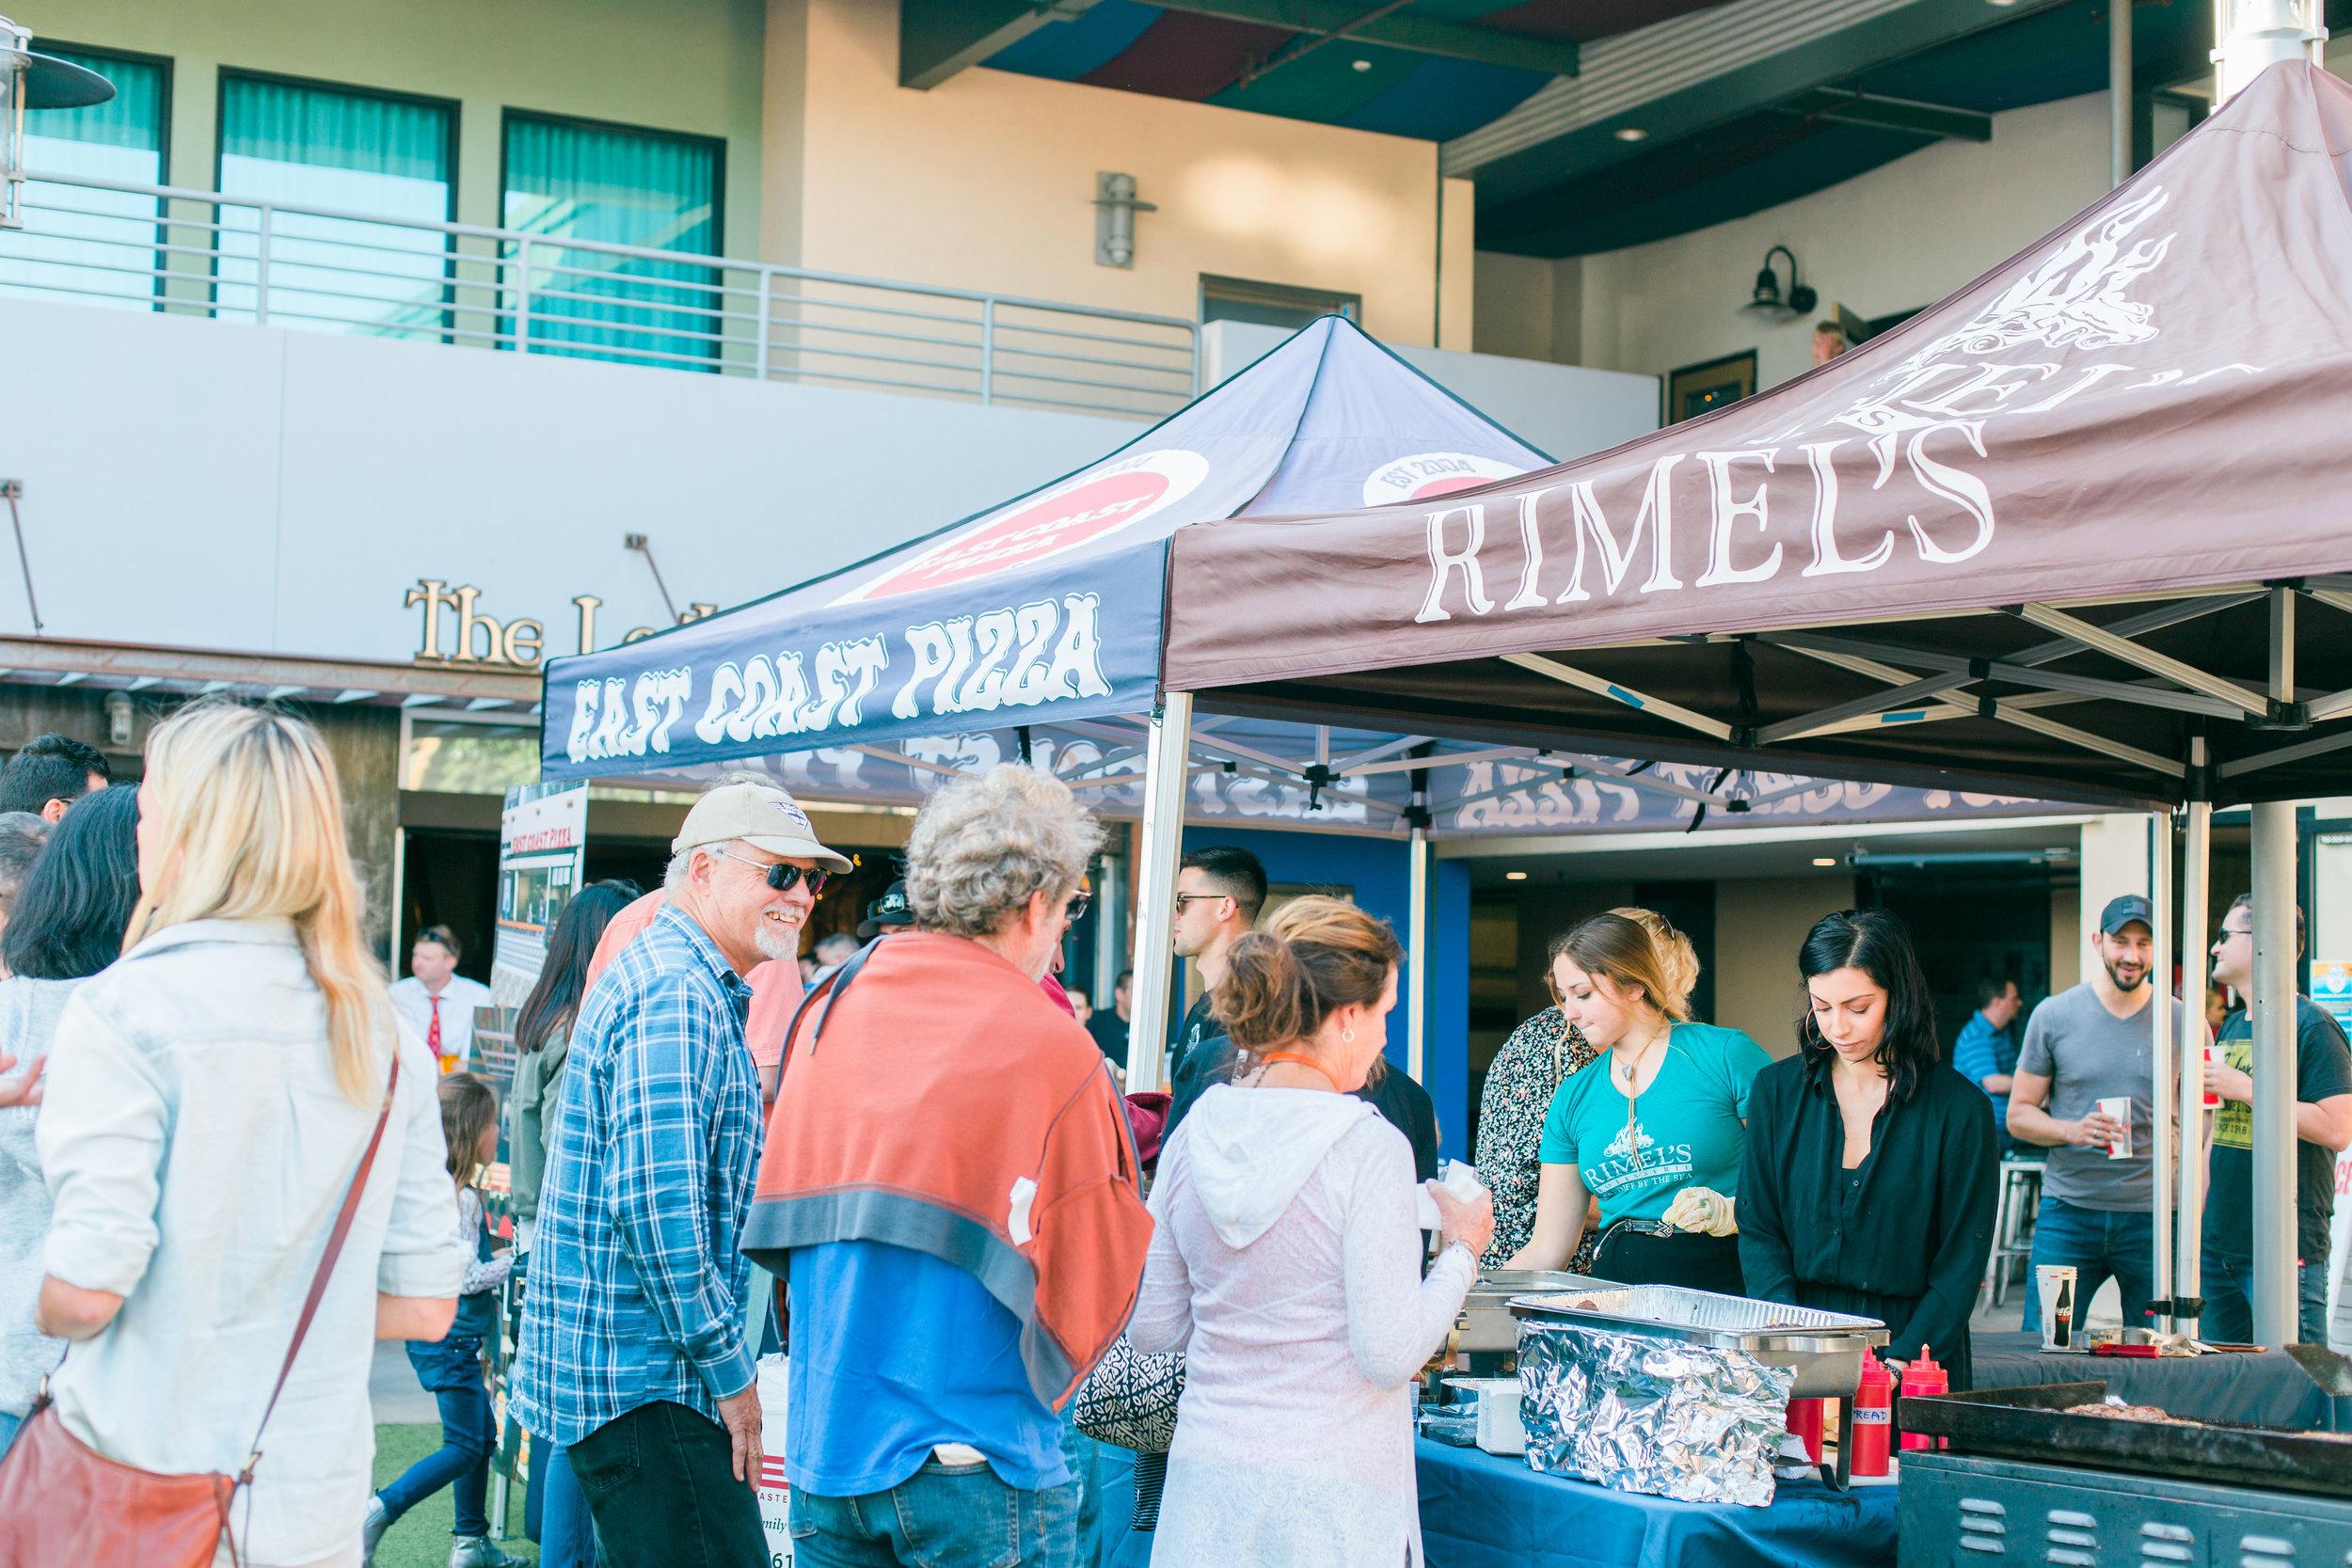 TOC Rimel's East Coast Pizza 2018-1.jpg